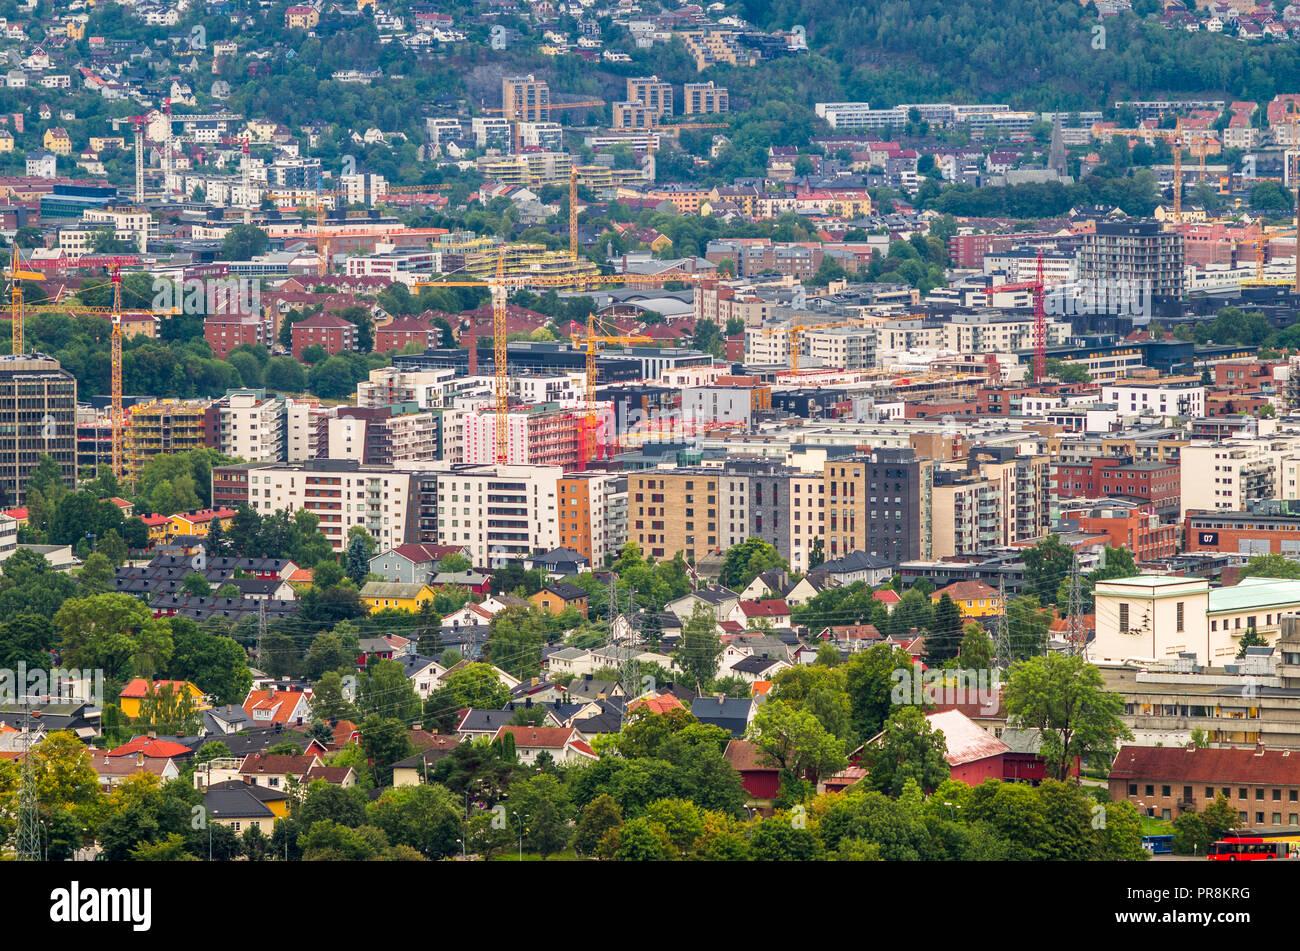 Loren- fast growing part of Oslo, Norway. Stock Photo